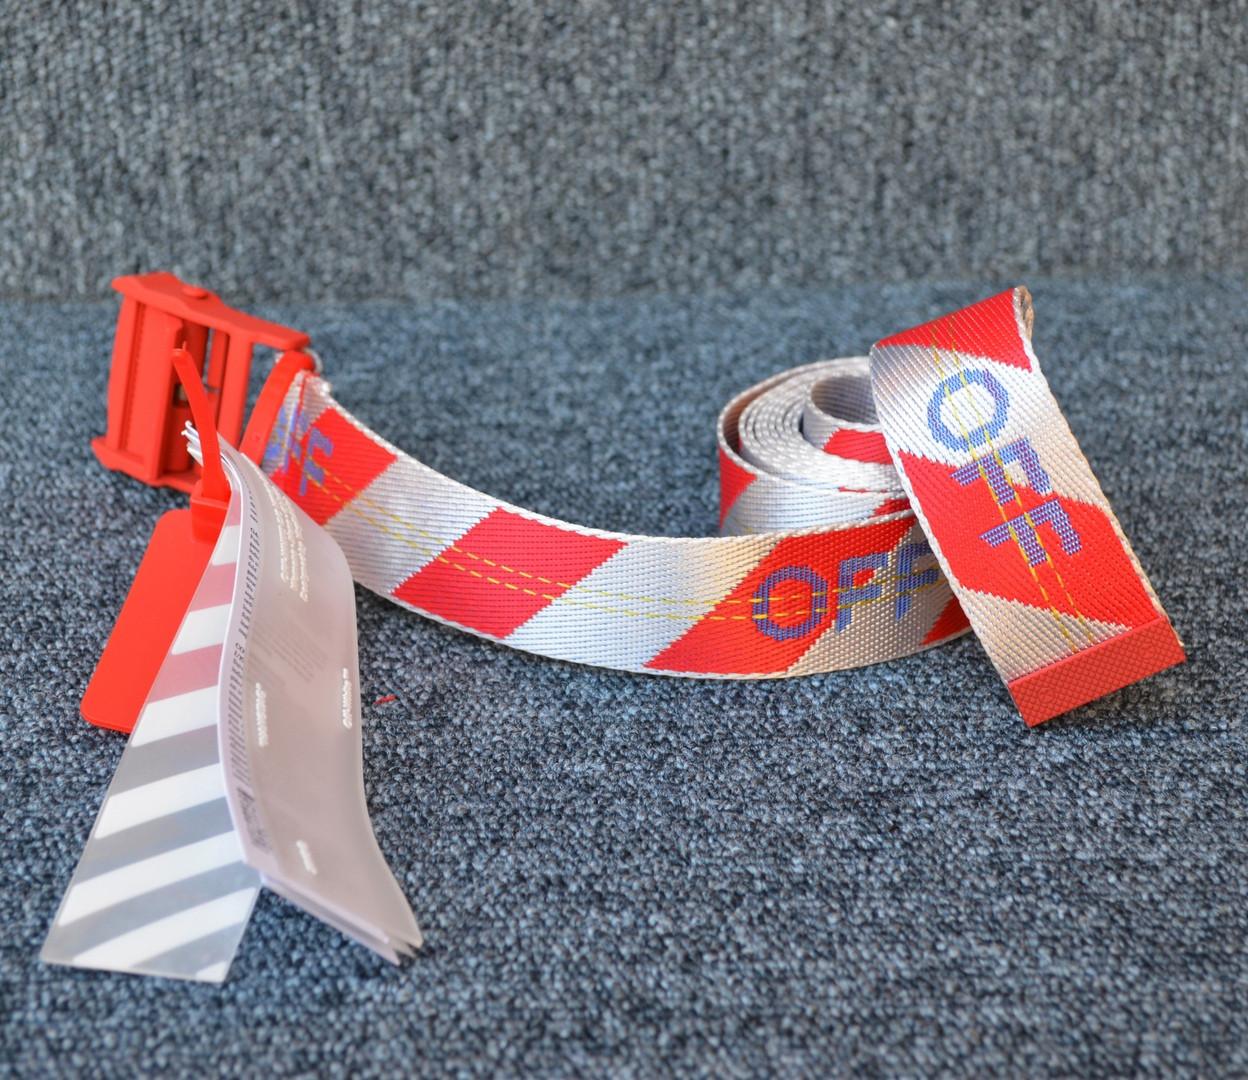 Ремінь Off-White striped red-white, Репліка